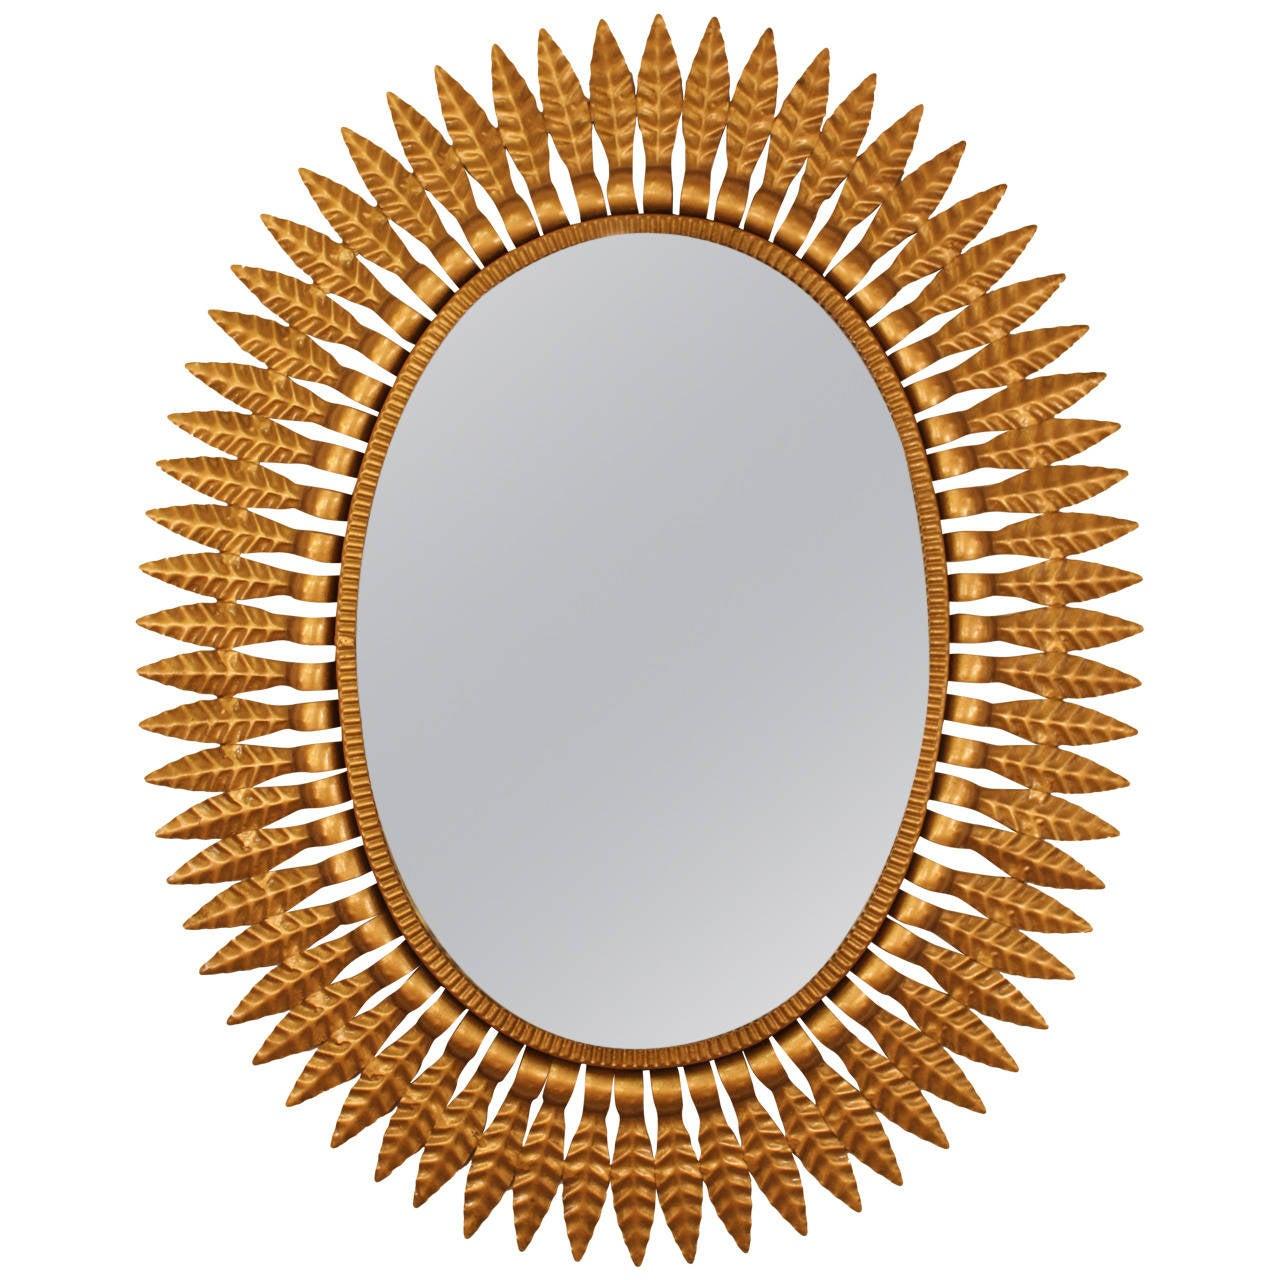 Hollywood regency gilt metal oval sunburst mirror spain for Sunburst mirror